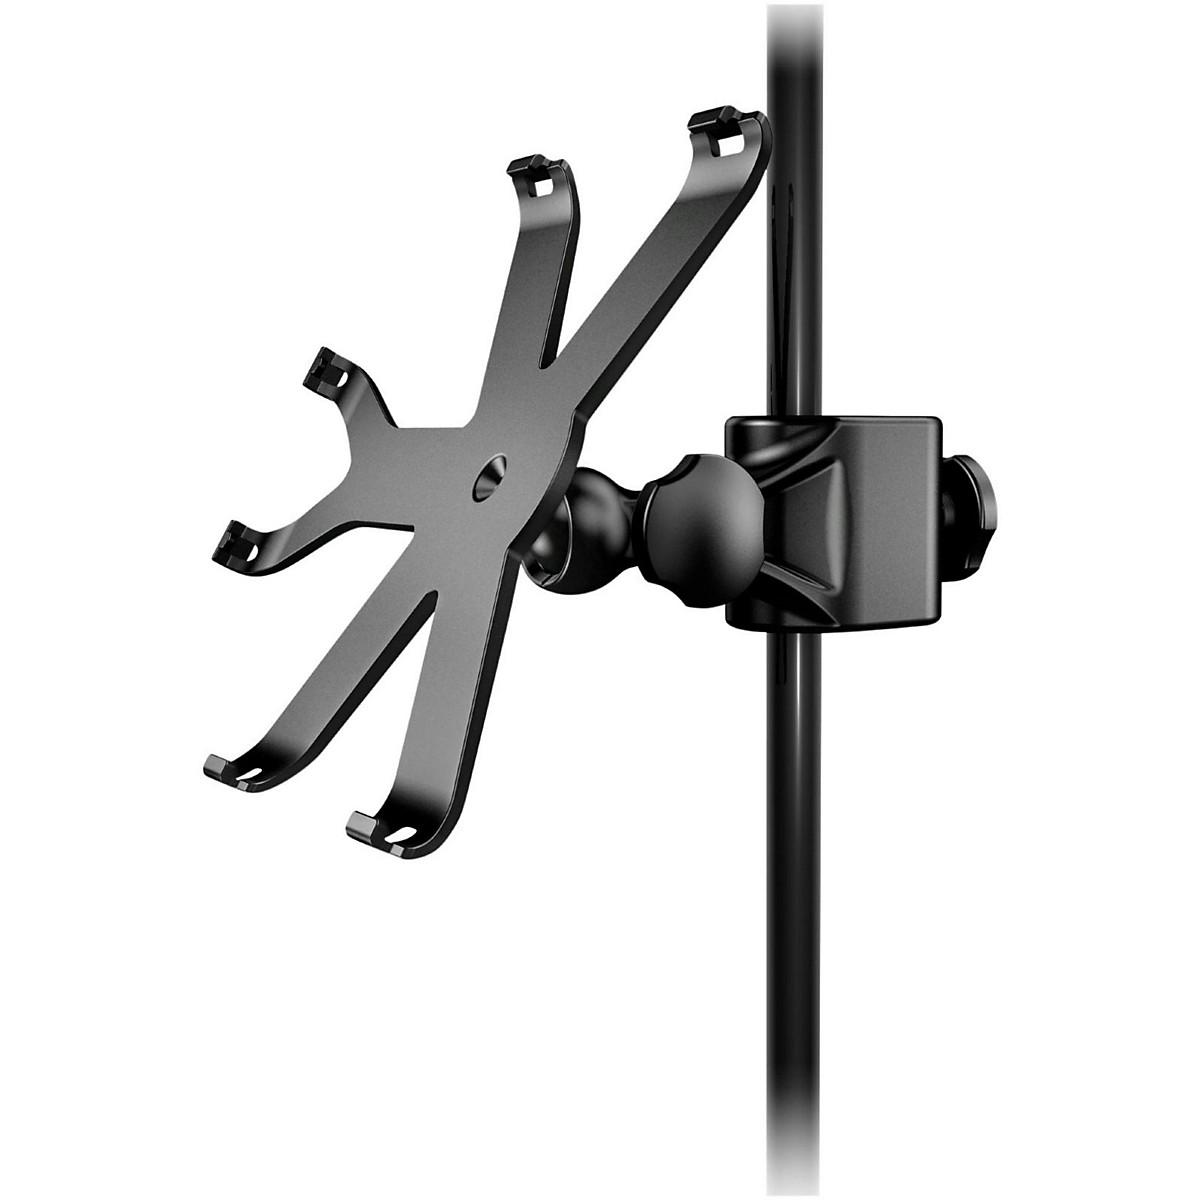 IK Multimedia iKlip 2 iPad Music Stand Adaptor